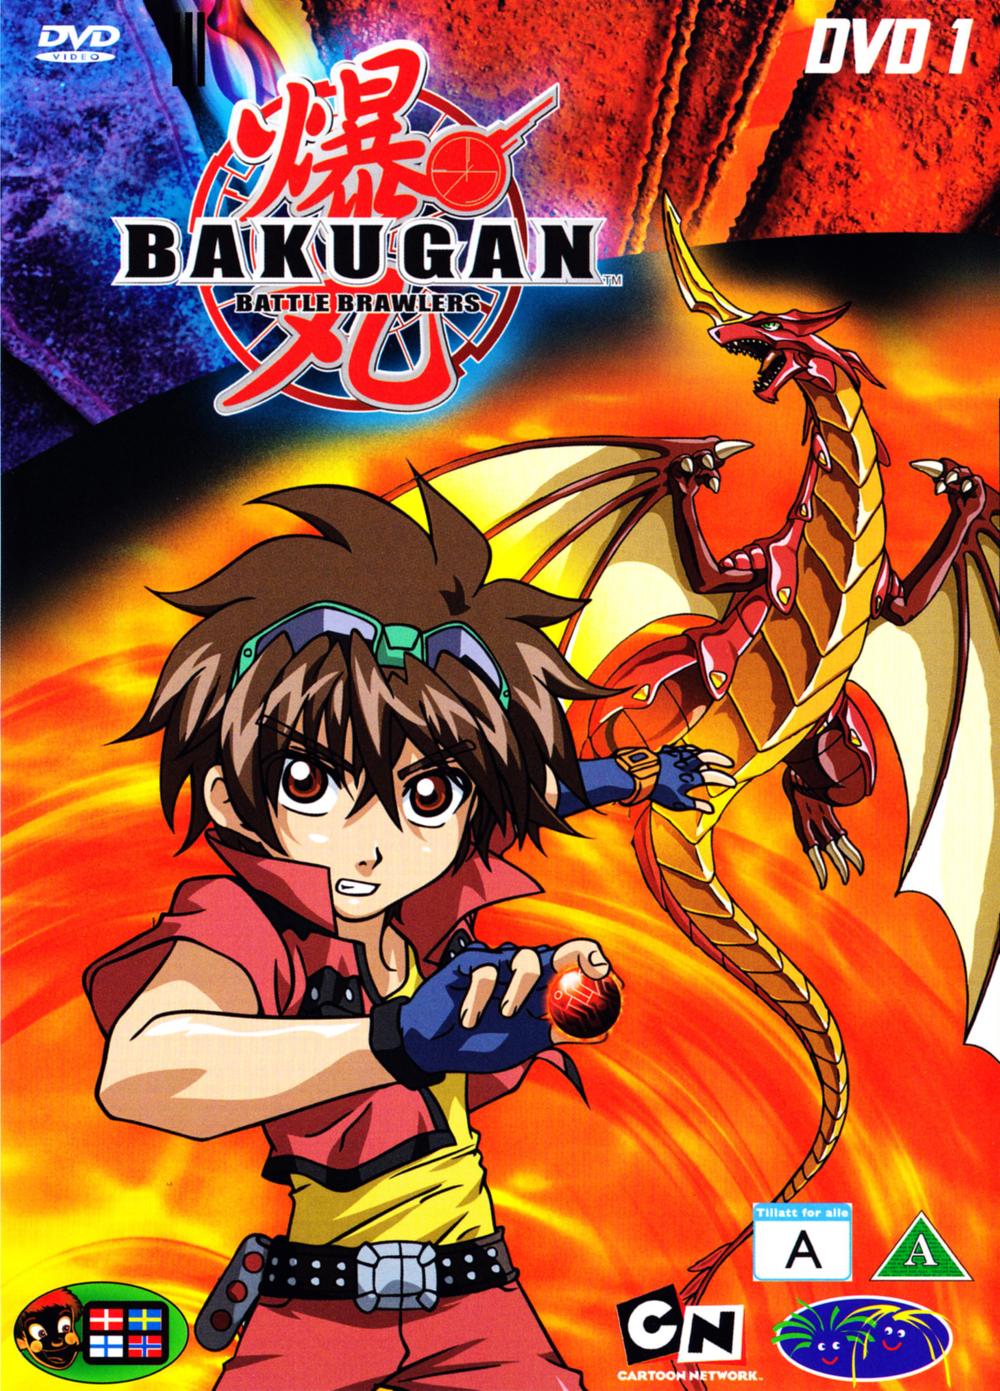 Bakugan Battle Brawlers/Episodes | Toonami Wiki | FANDOM